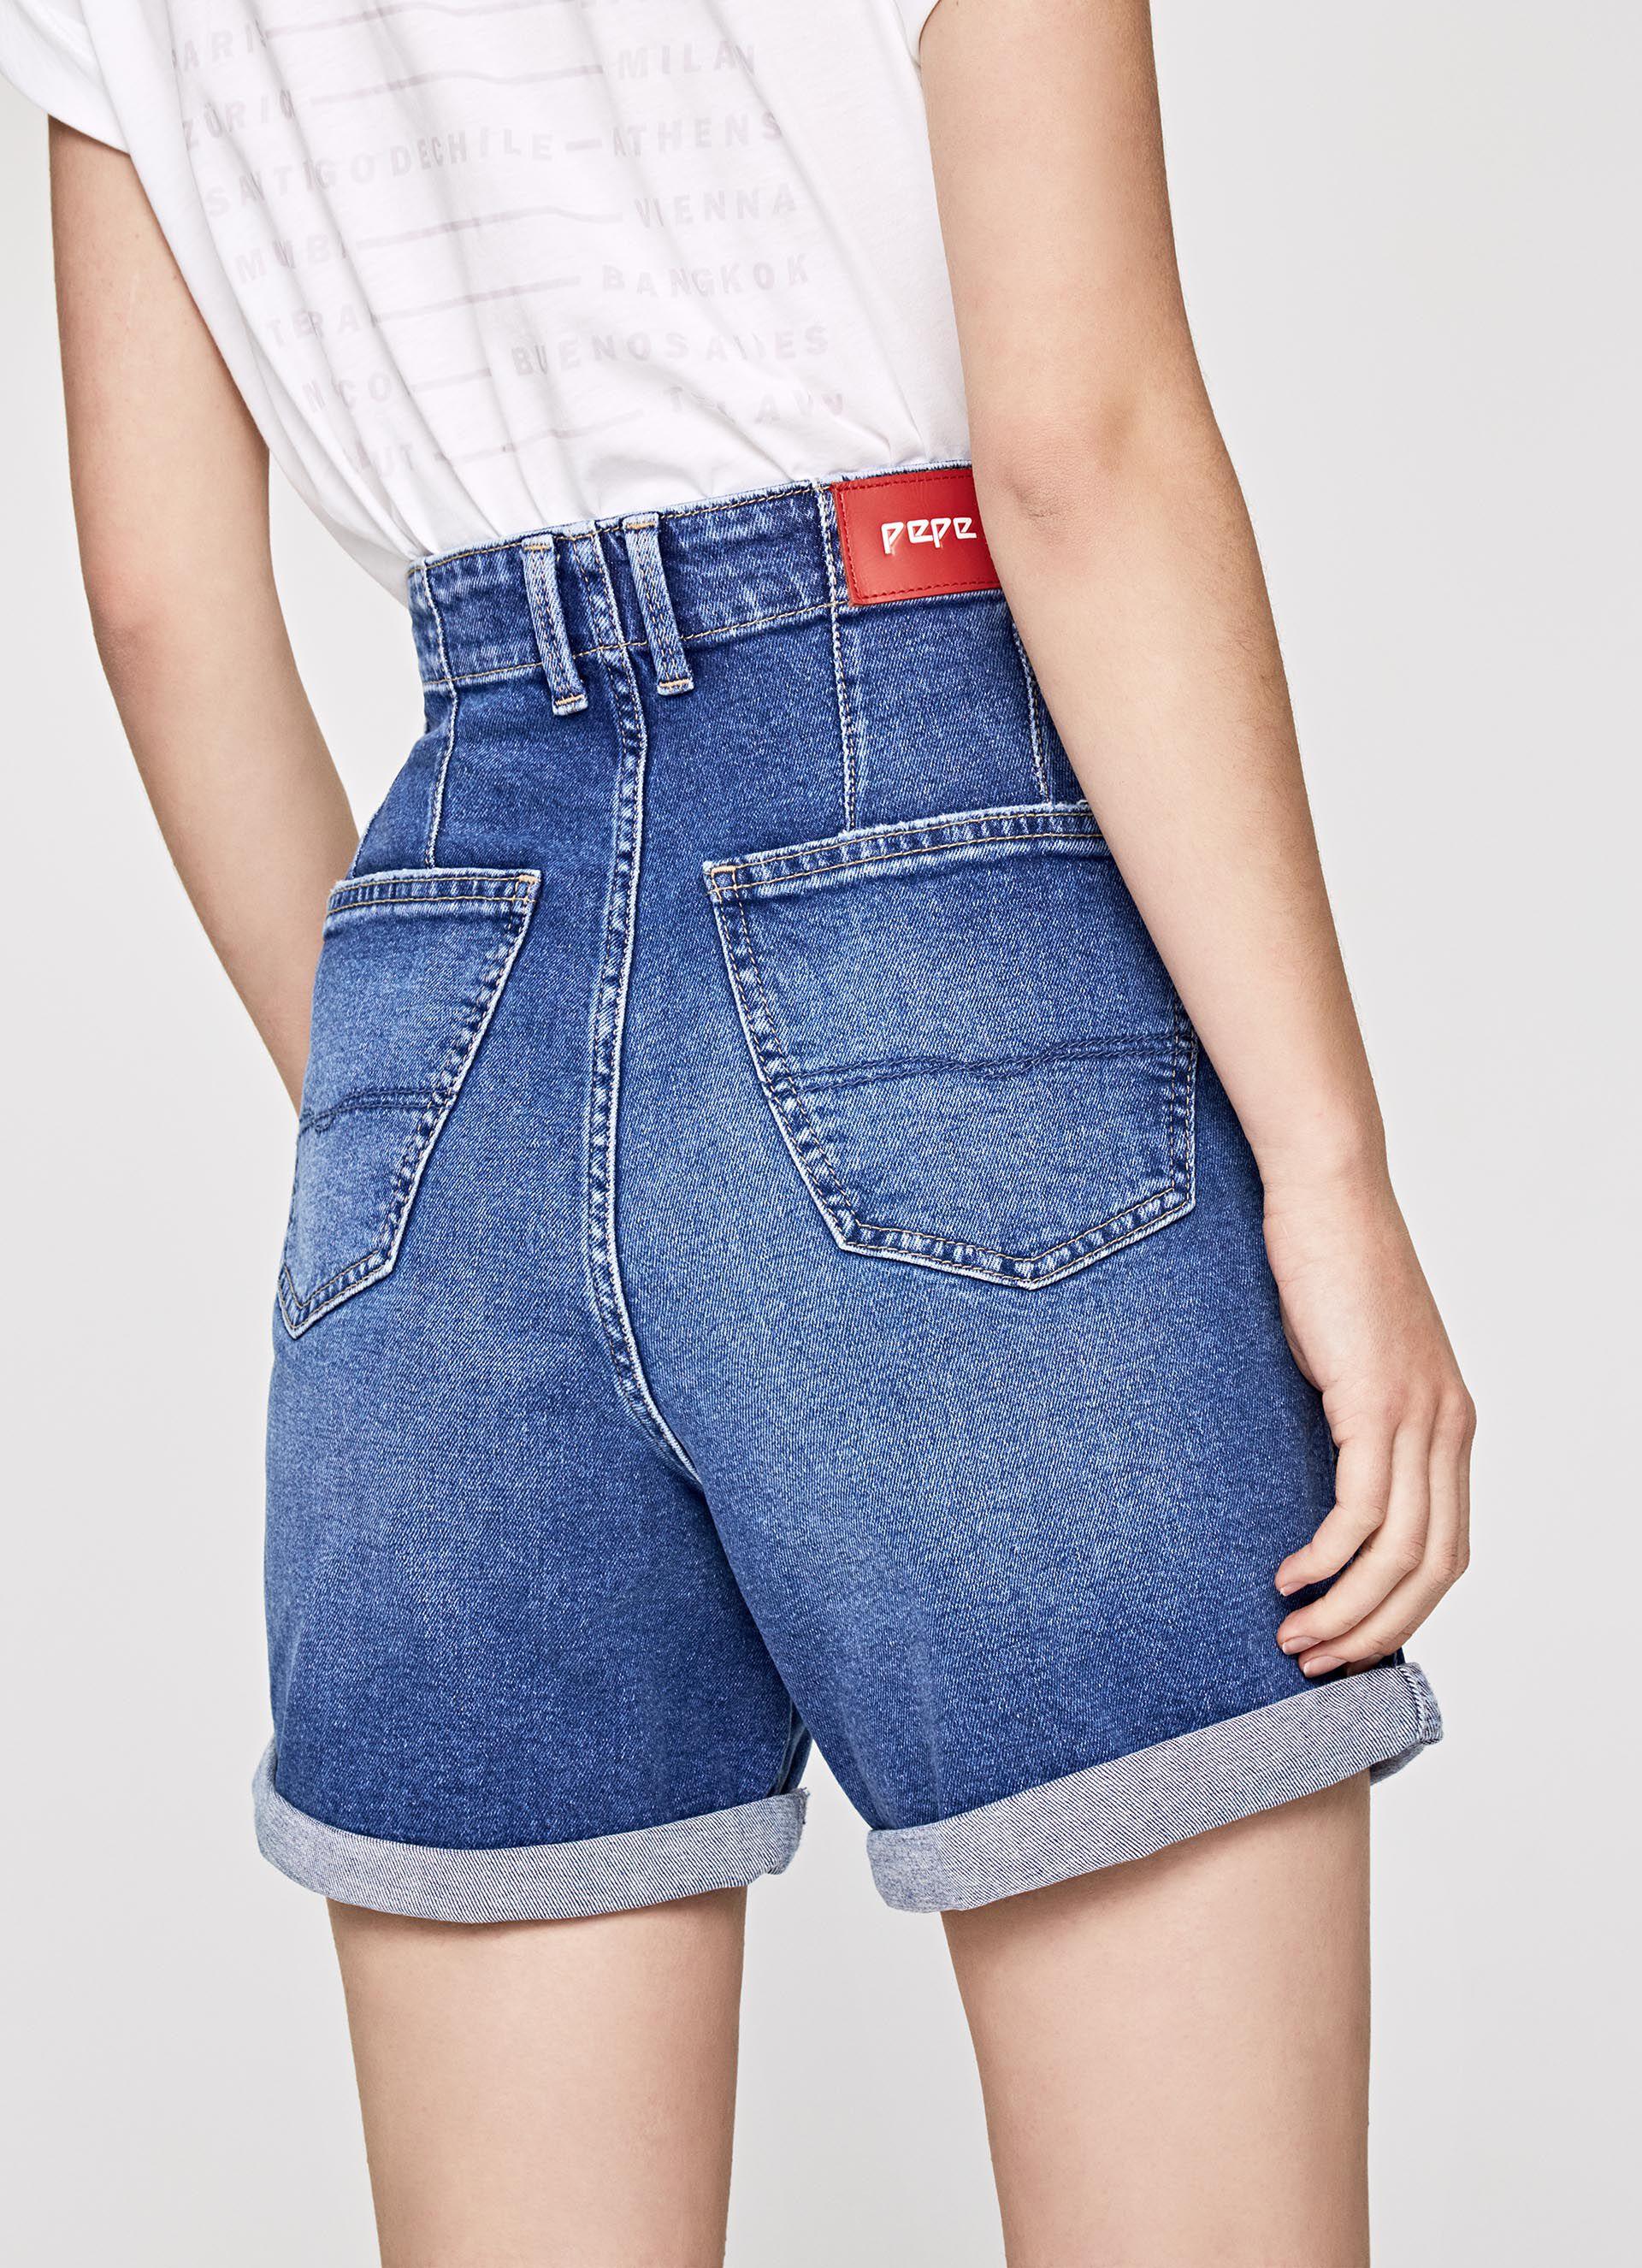 Haute Short Taille Haute Short Daisie Short Haute Daisie Taille Taille pSMqUzV